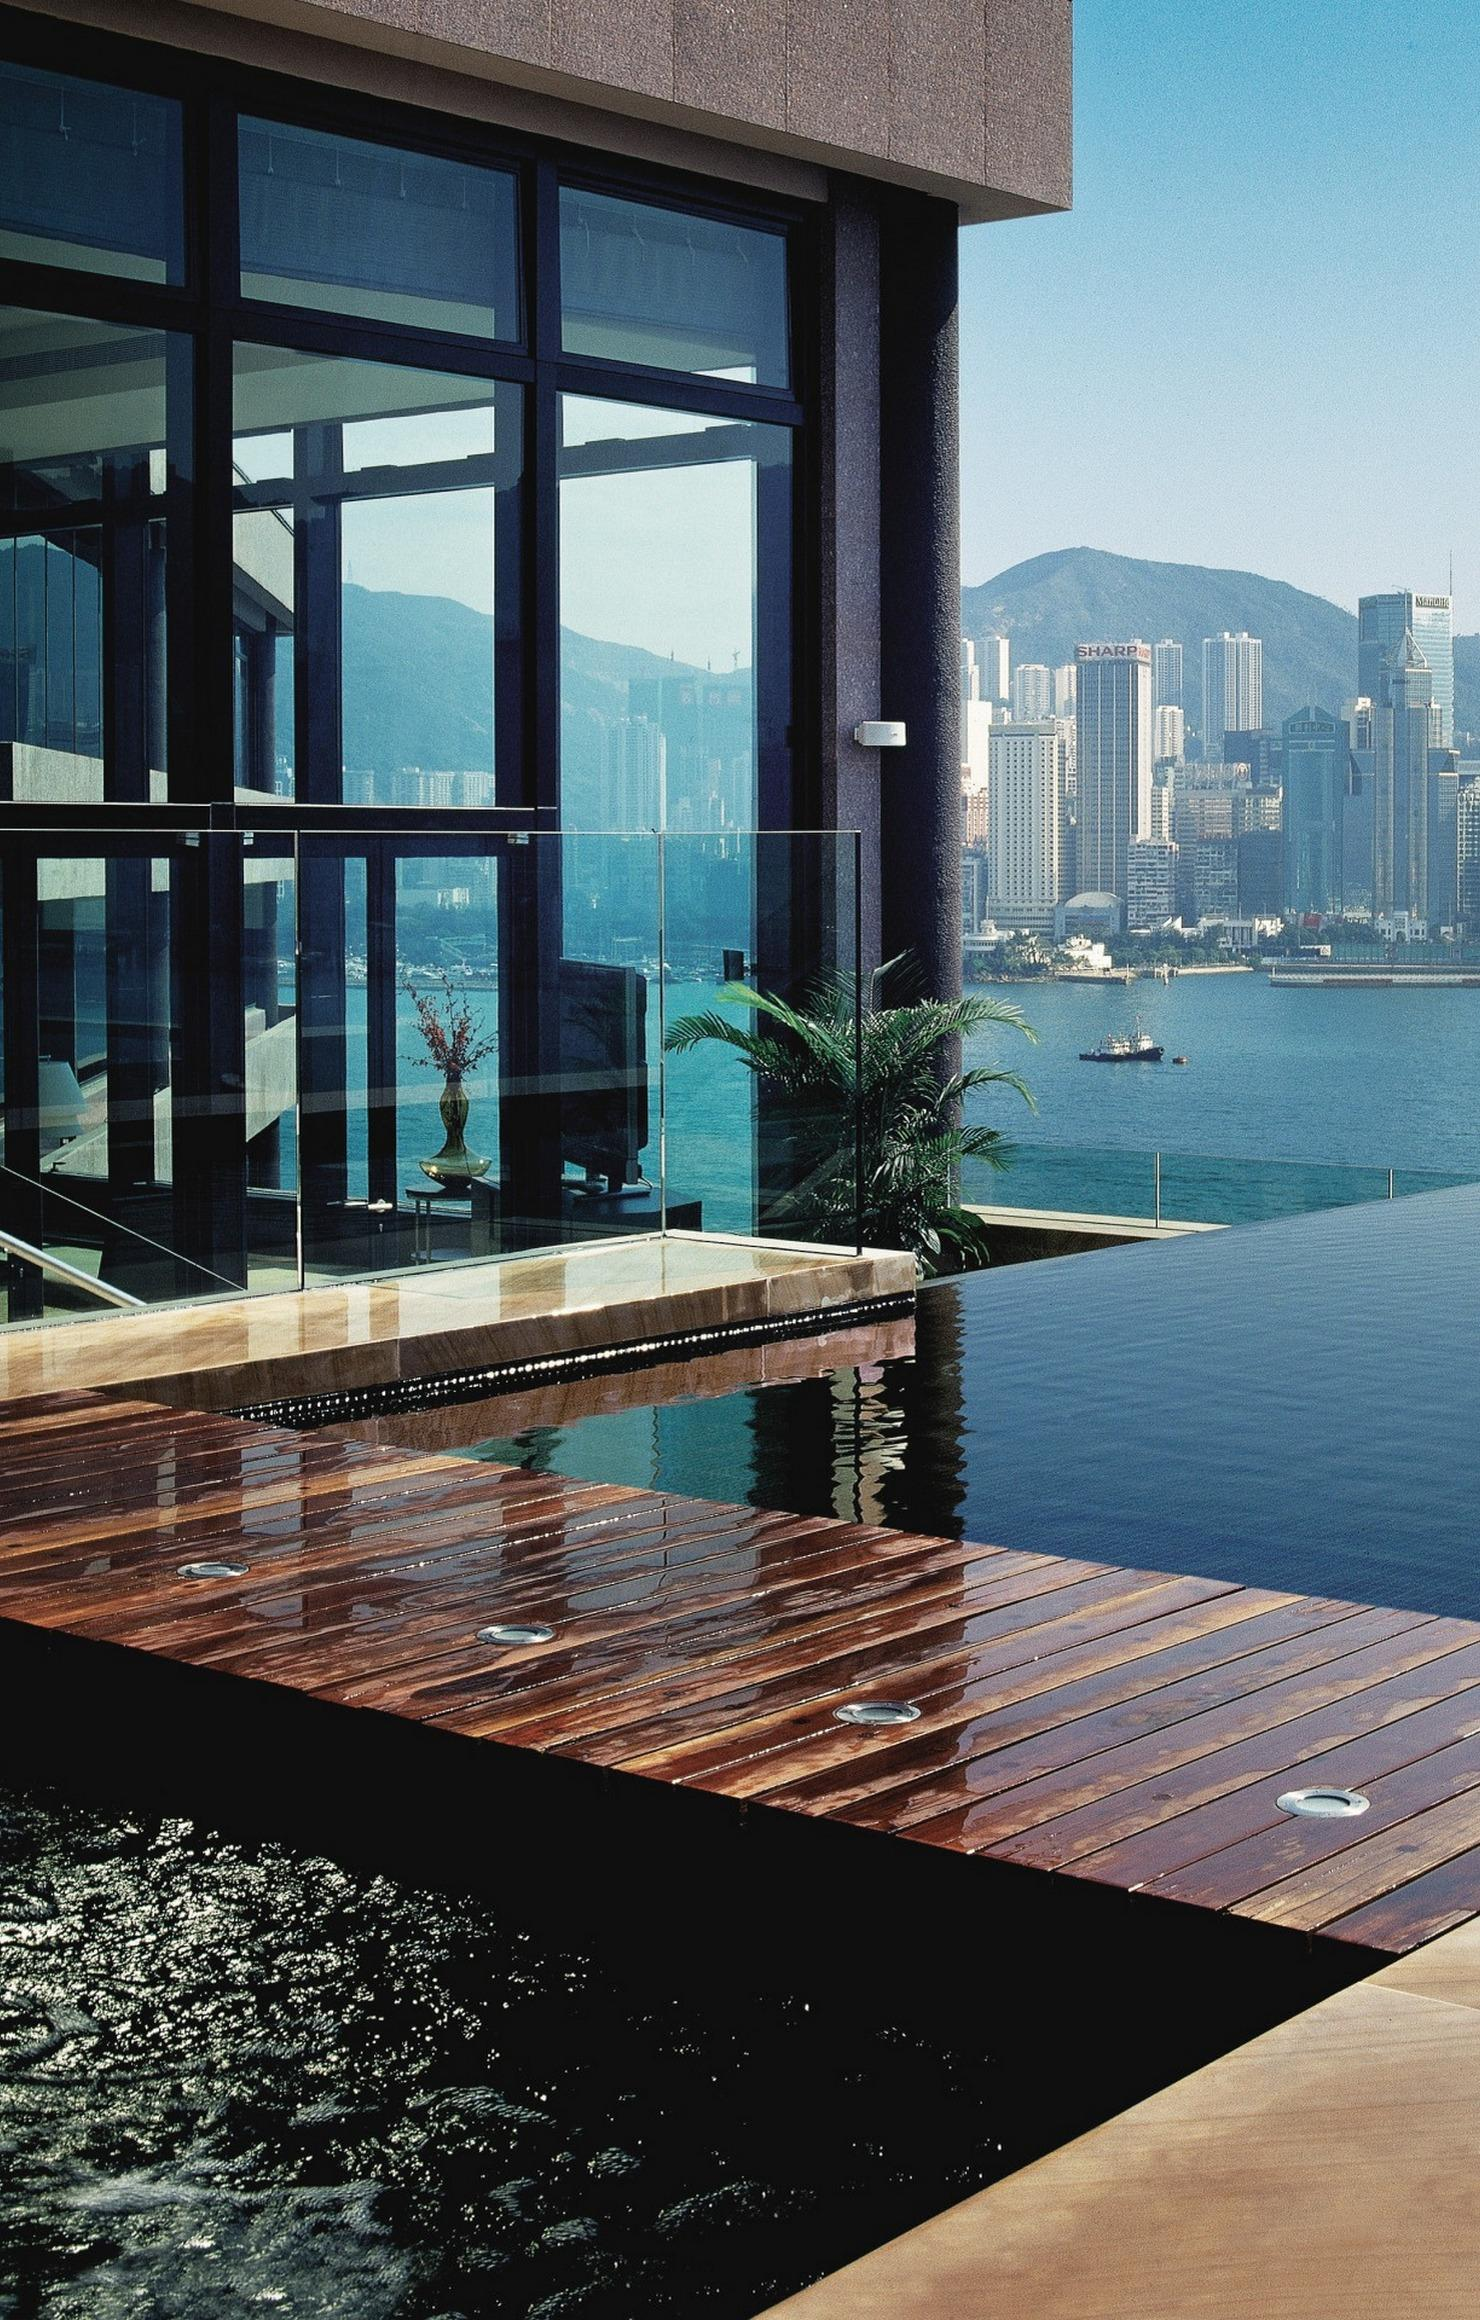 luxury house pool skuscrapers panoramic view retina